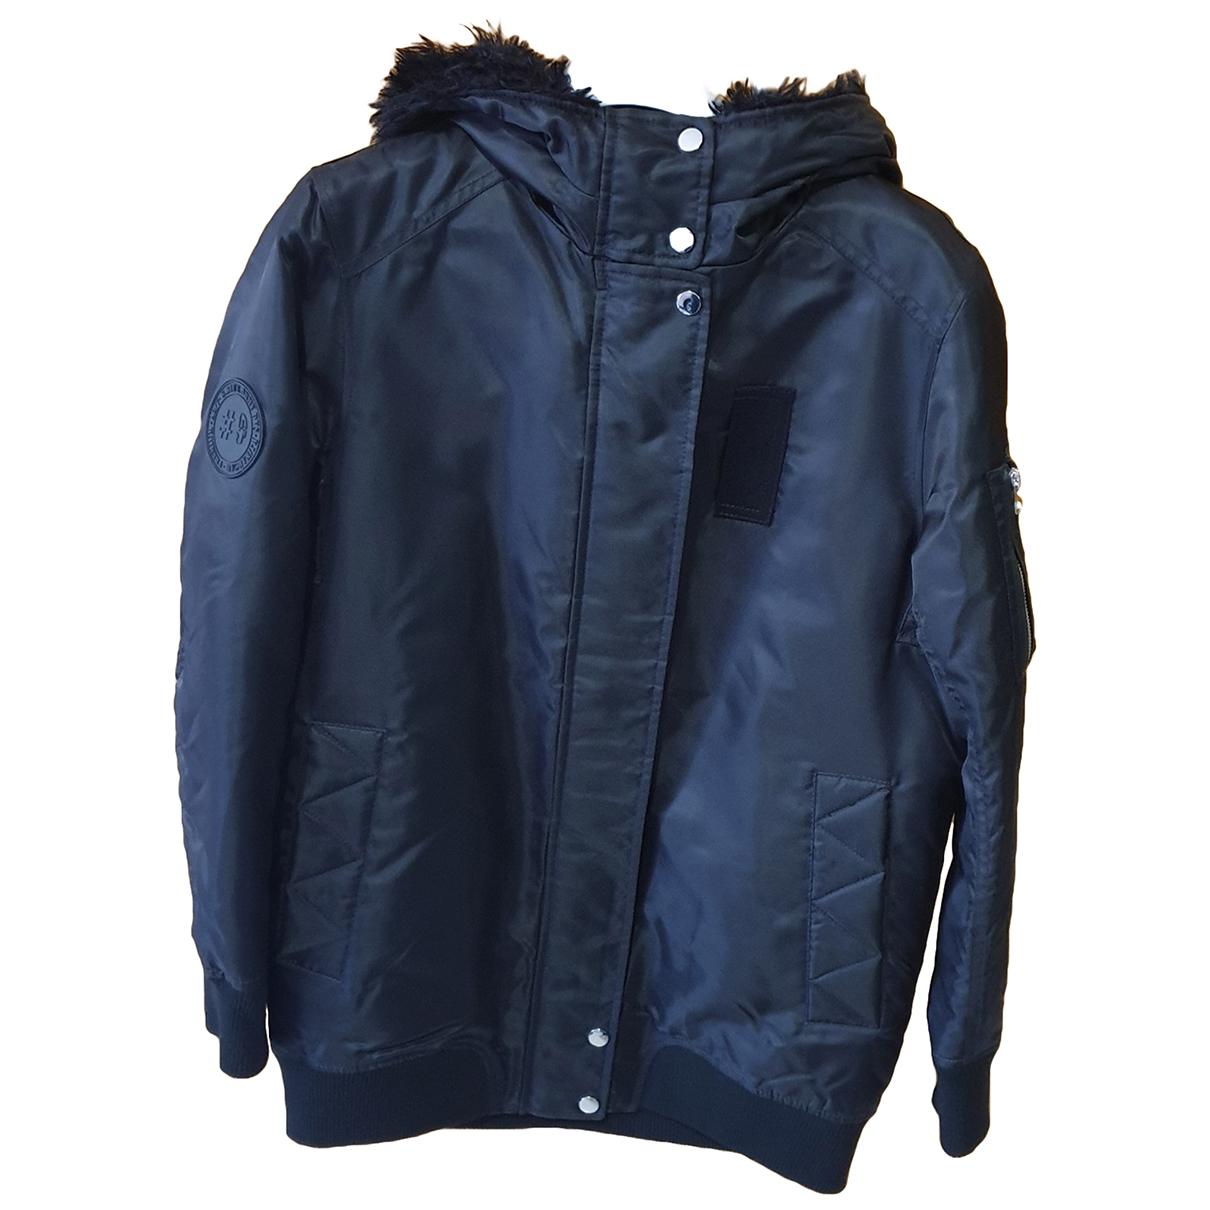 Zara \N Lederjacke in  Schwarz Polyester